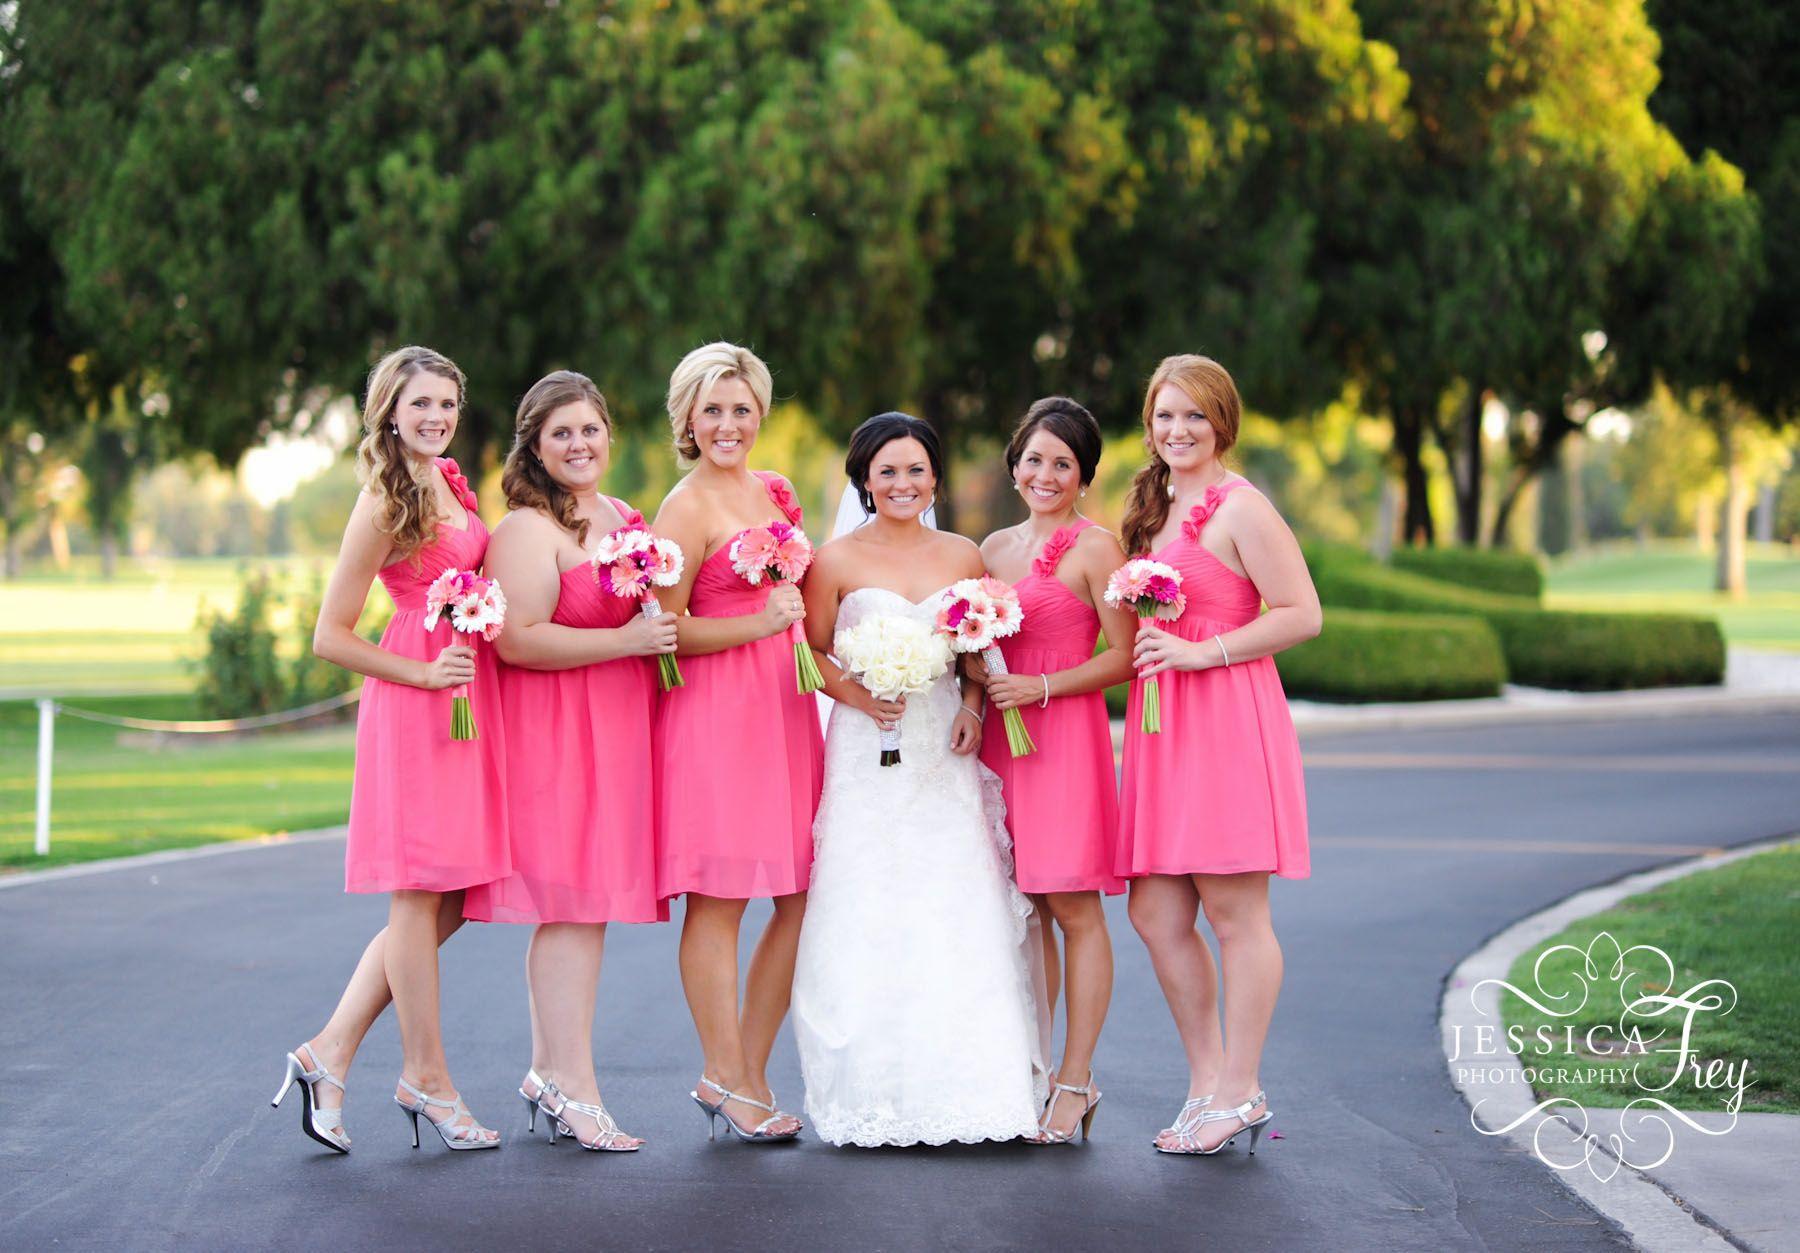 Bridesmaid hot pink my wedding plans pinterest weddings